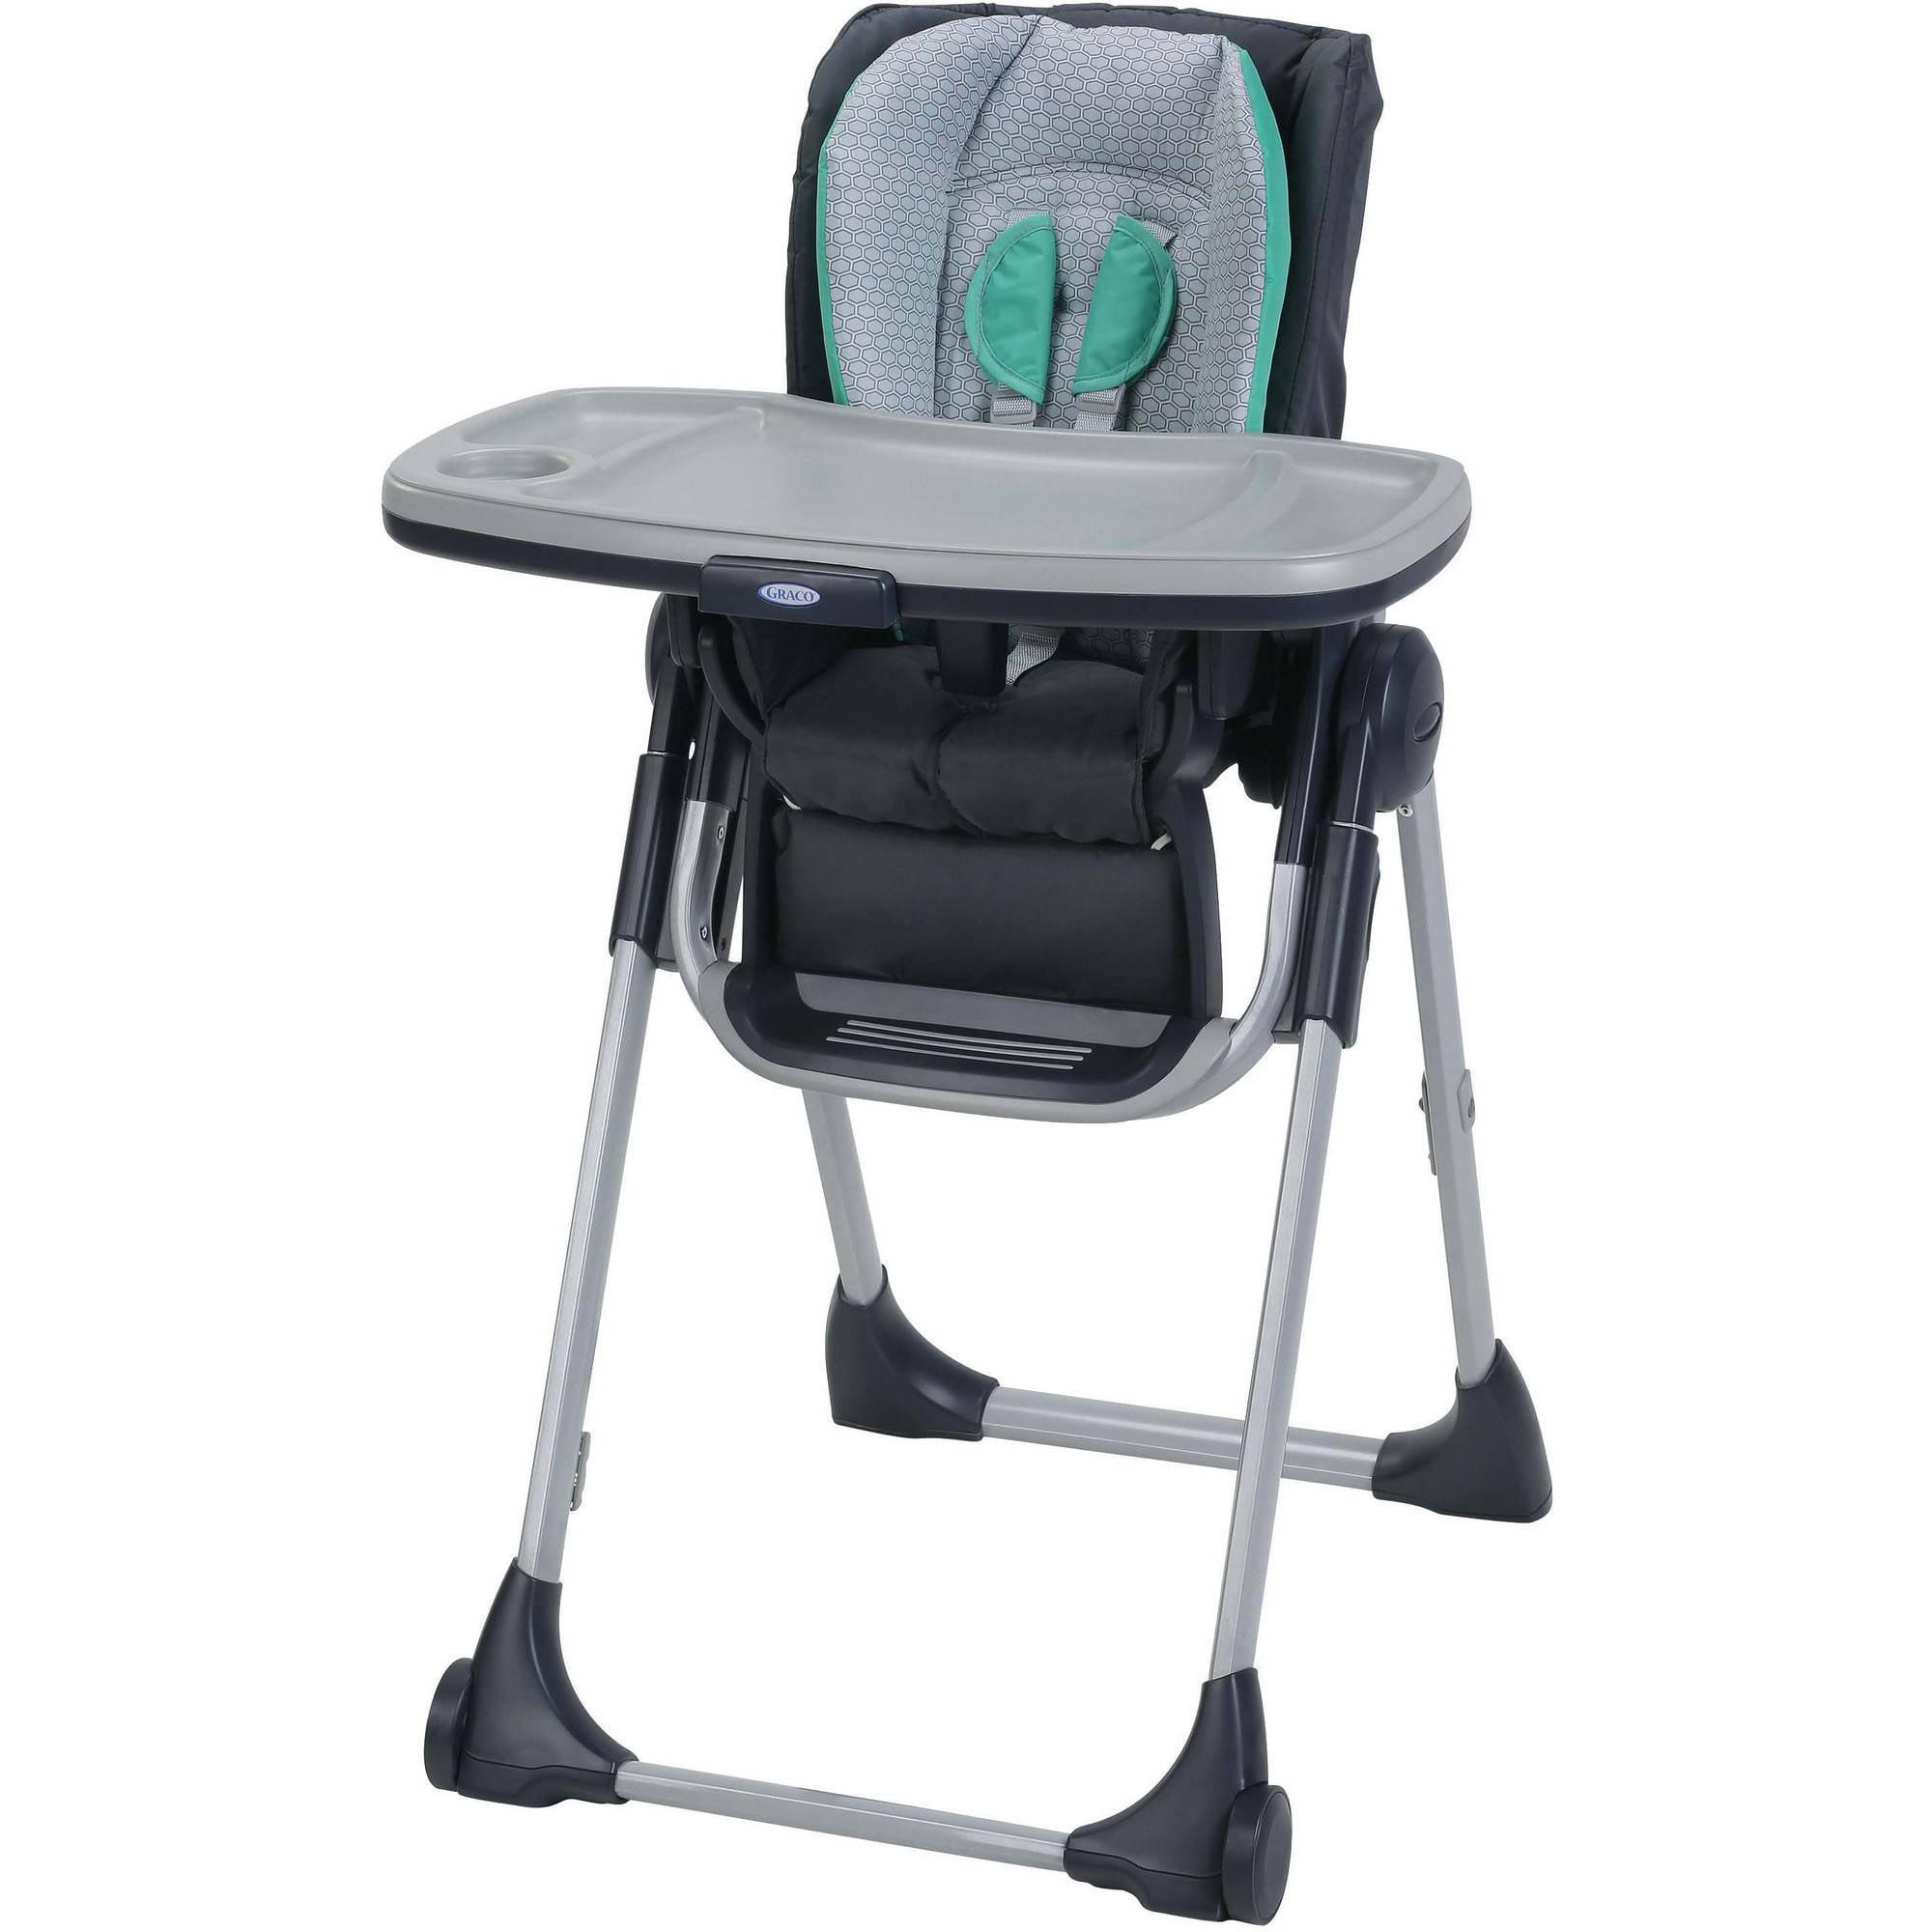 Graco Swift Fold LX High Chair, Basin